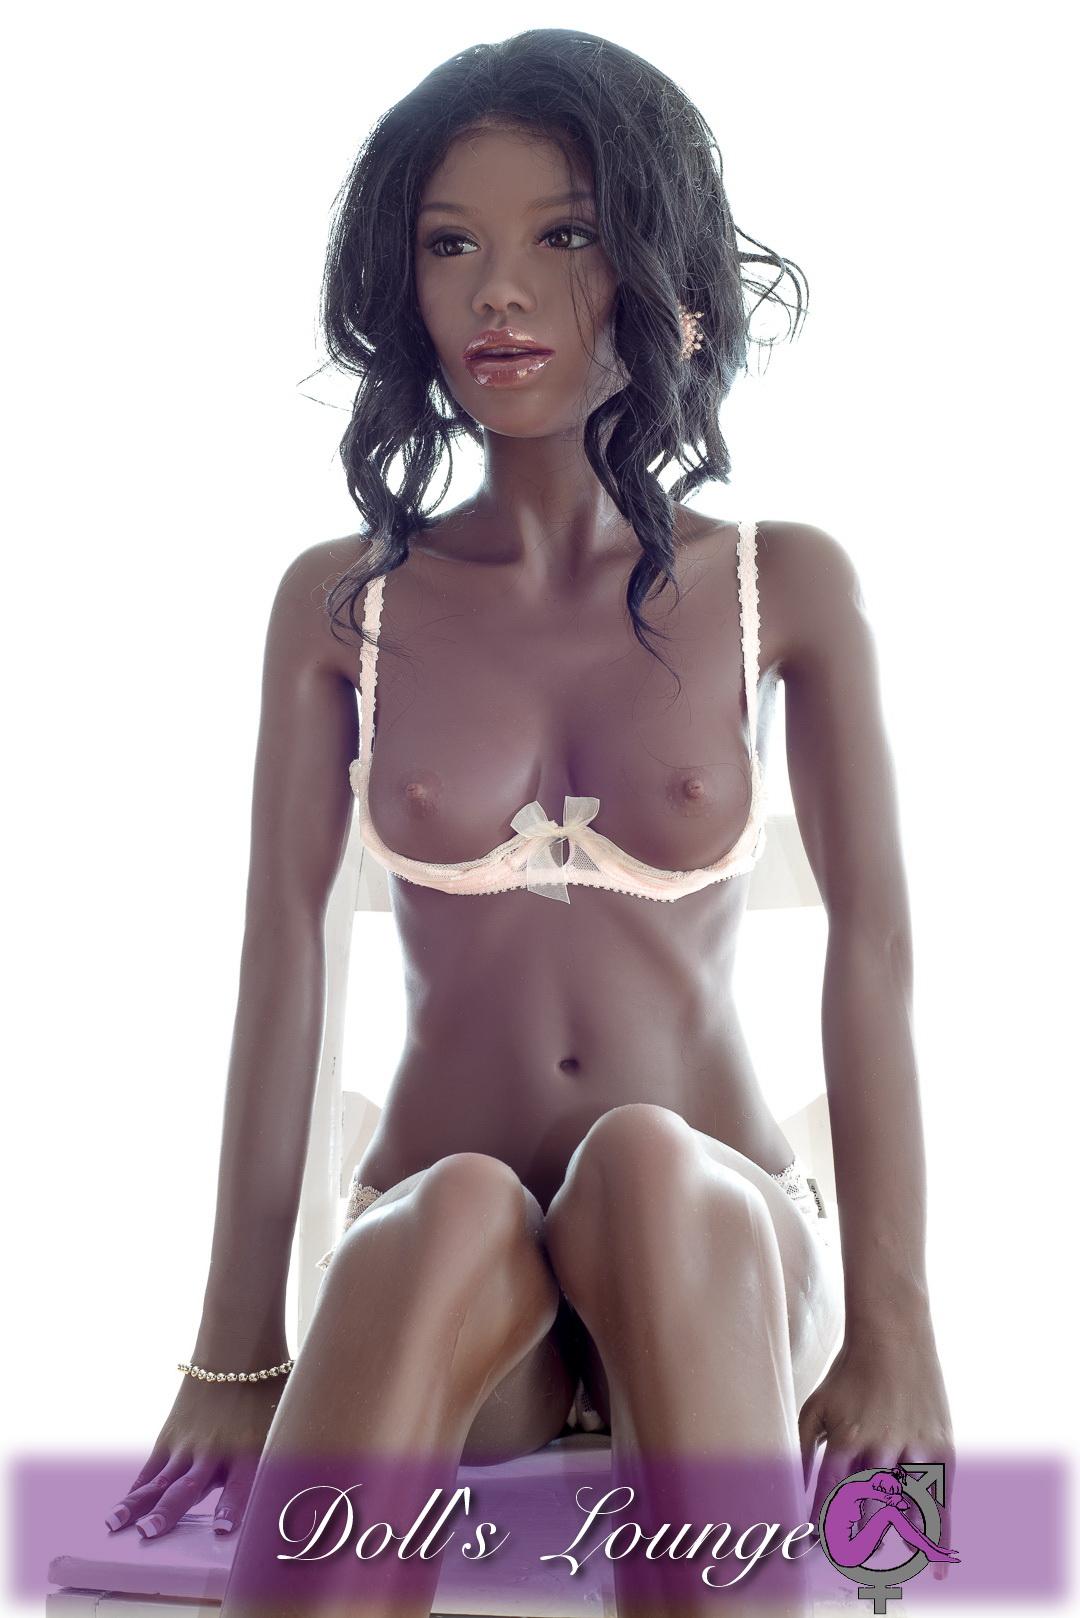 TPE 153cm Ebony Sexpuppe Naira , der Schokohase unter den lebensechten realDoll-Klassen Gummipuppen